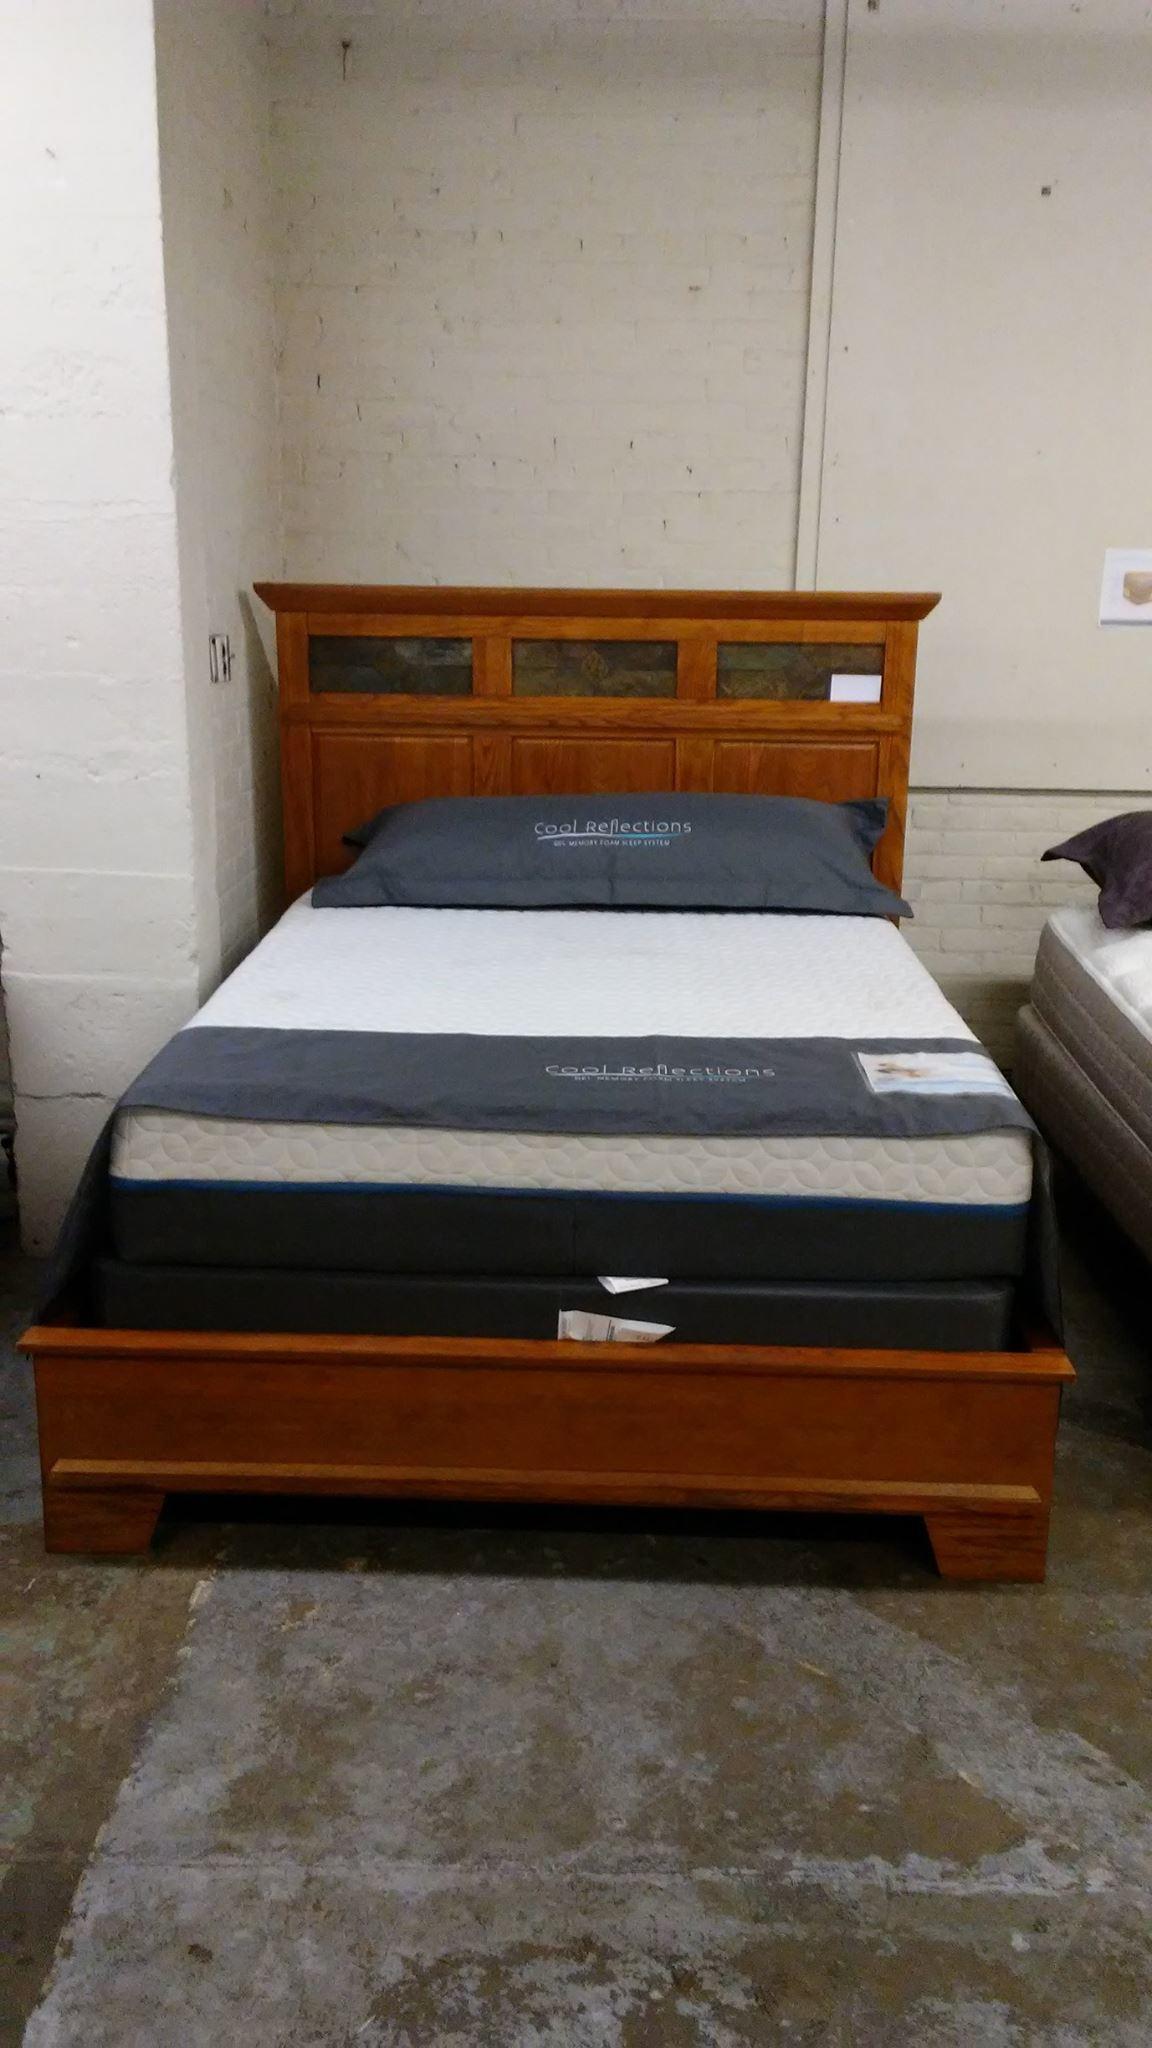 D & B Furniture - Payette Flea Market image 5